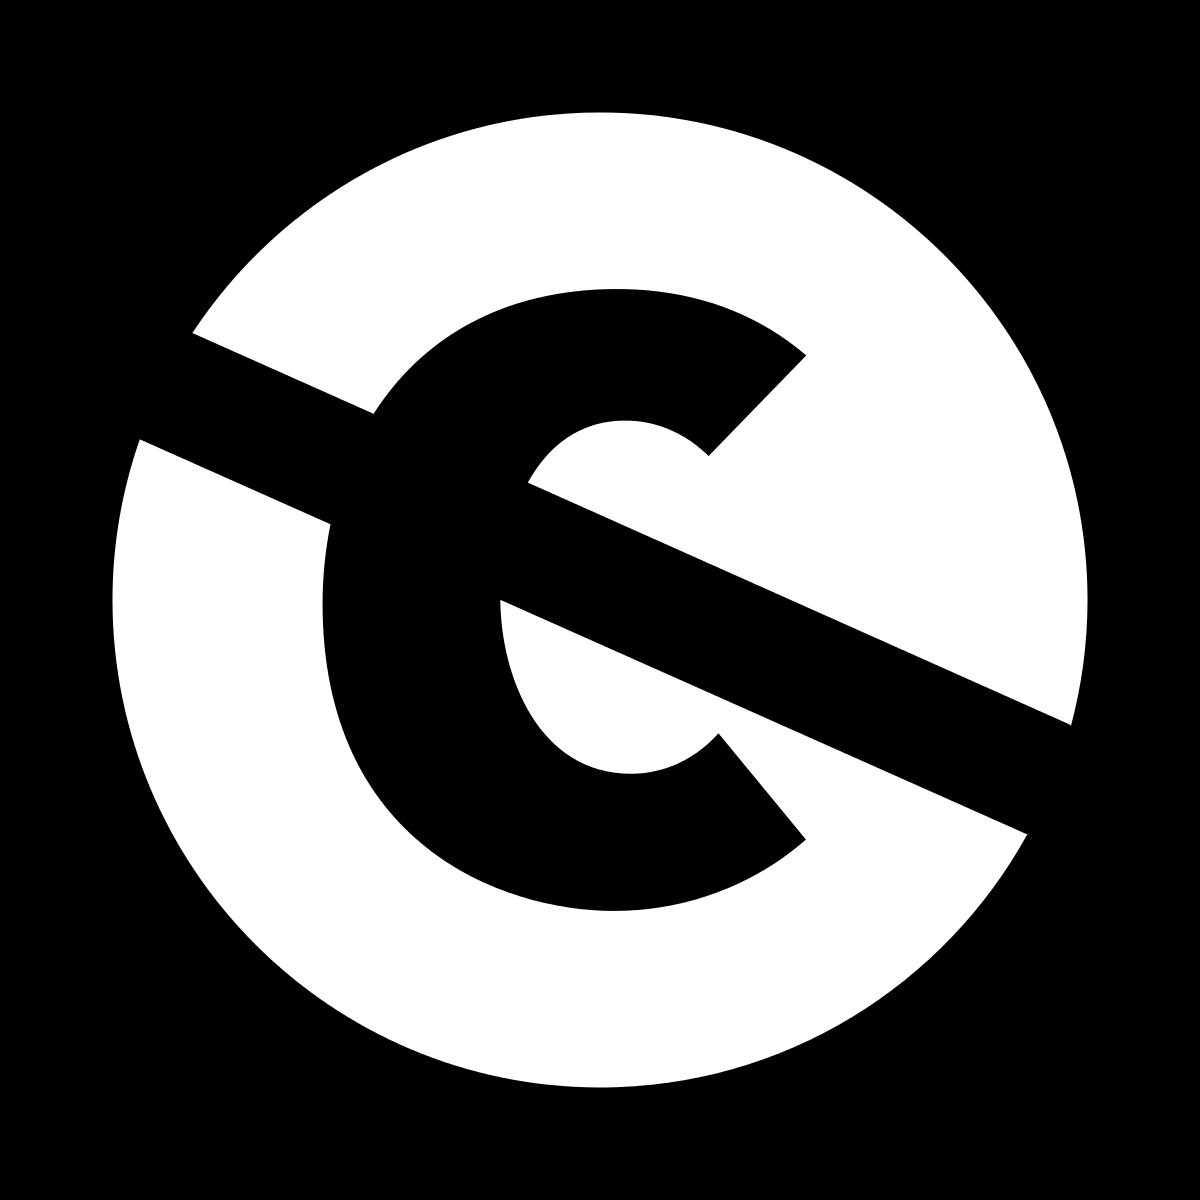 Public Domain Mark.